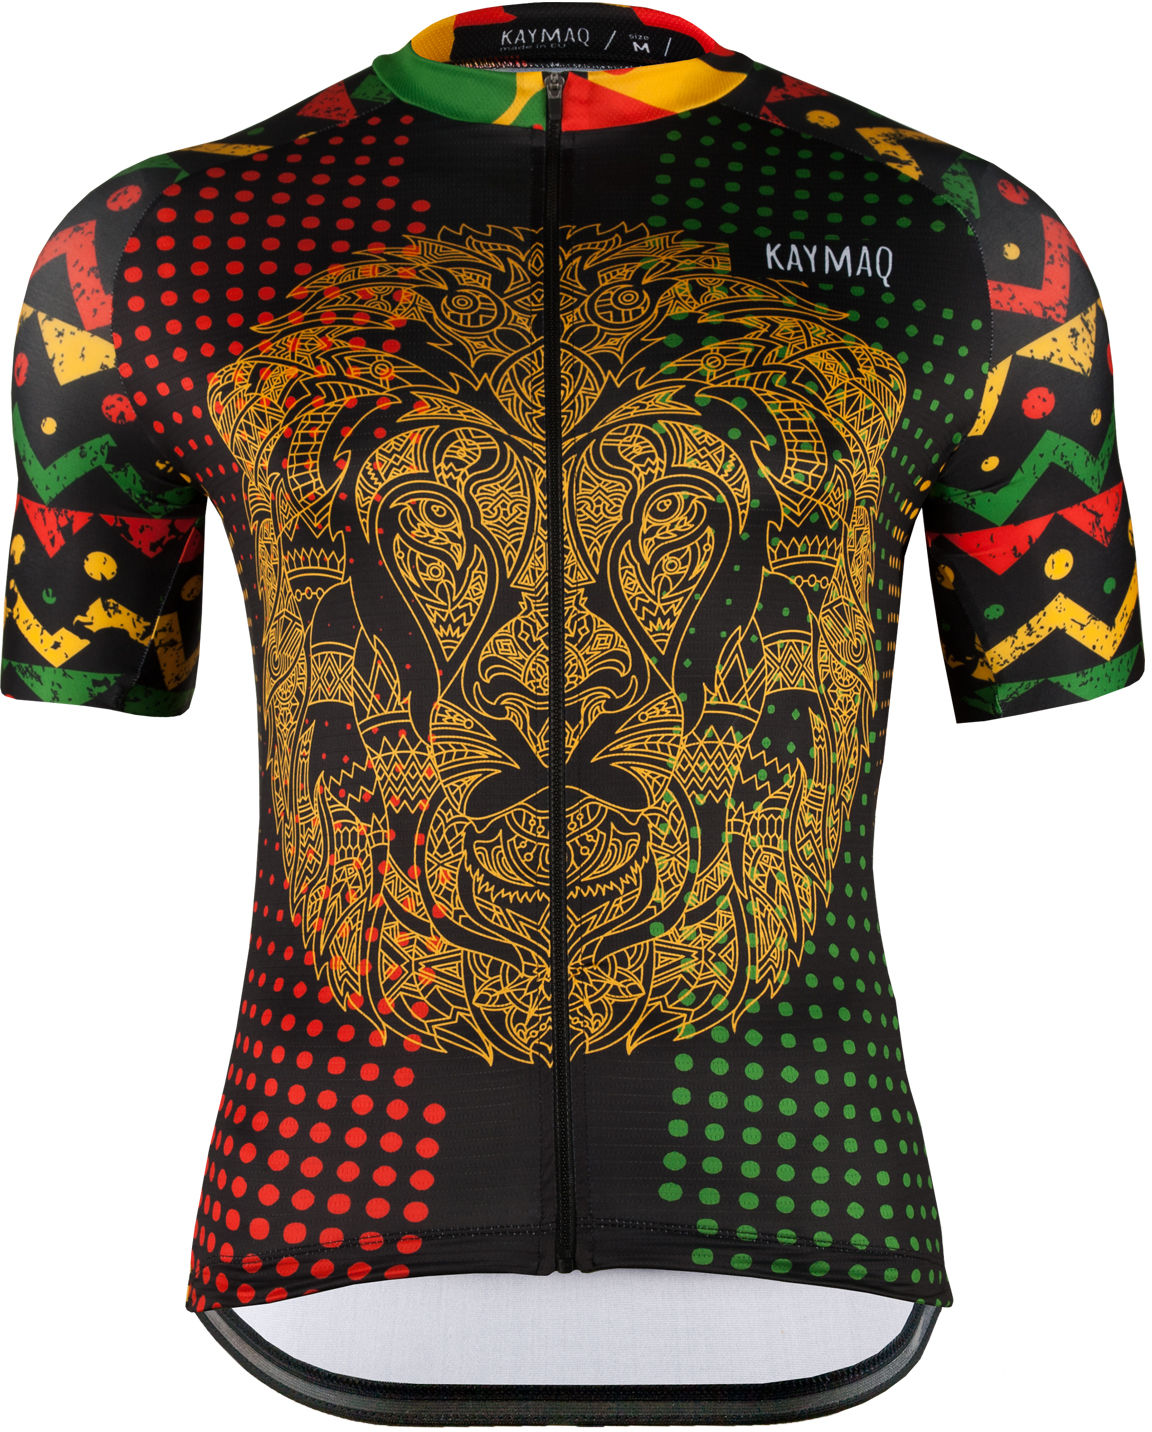 KAYMAQ RACE M51 męska koszulka rowerowa z krótkim rękawem Rozmiar: L,m51_kymq_kosz